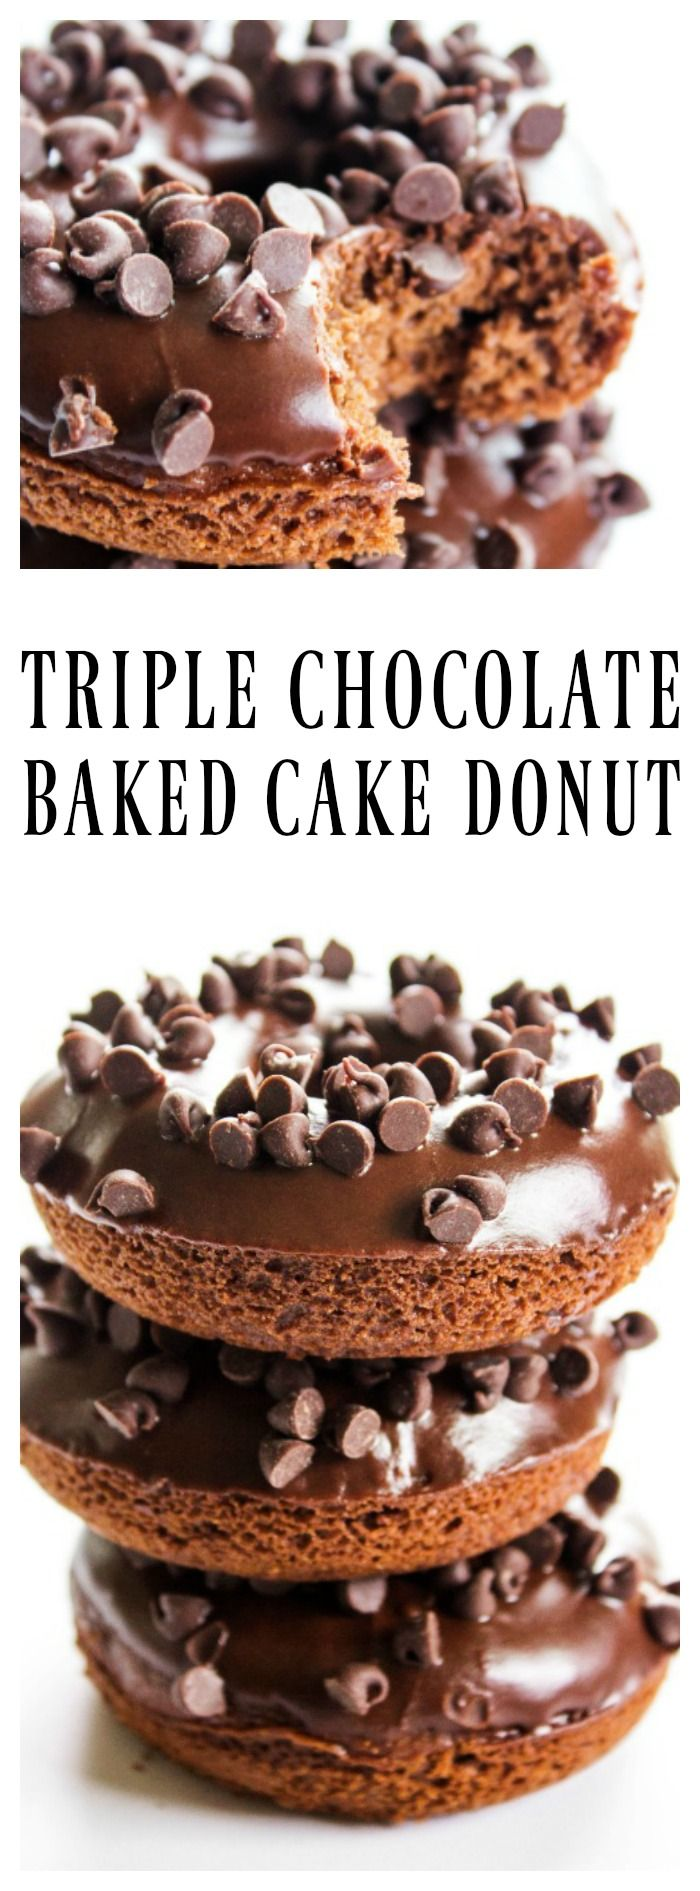 TRIPLE CHOCOLATE BAKED CAKE DONUT RECIPE